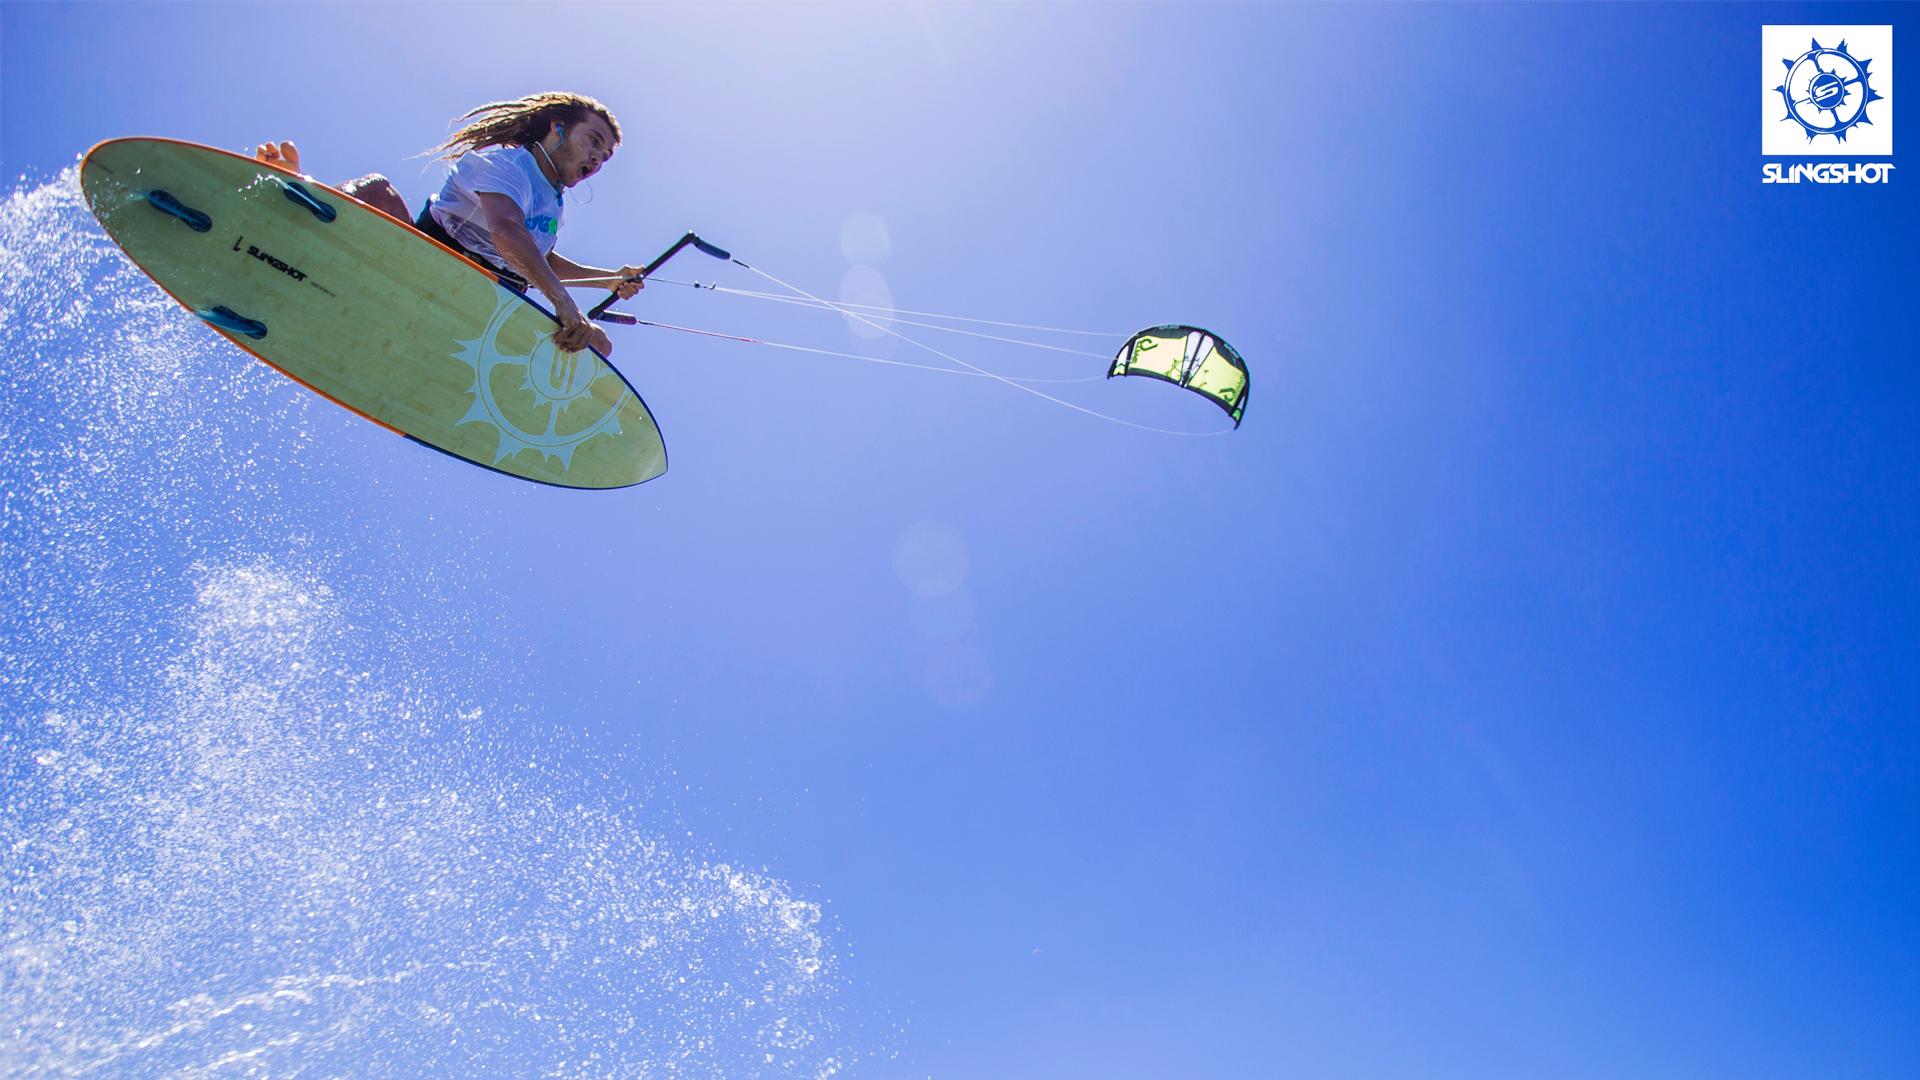 kitesurf wallpaper image - Patrick Rebstock on the new 2015 Slingshot Rally kite and Celeritas board - in resolution: High Definition - HD 16:9 1920 X 1080